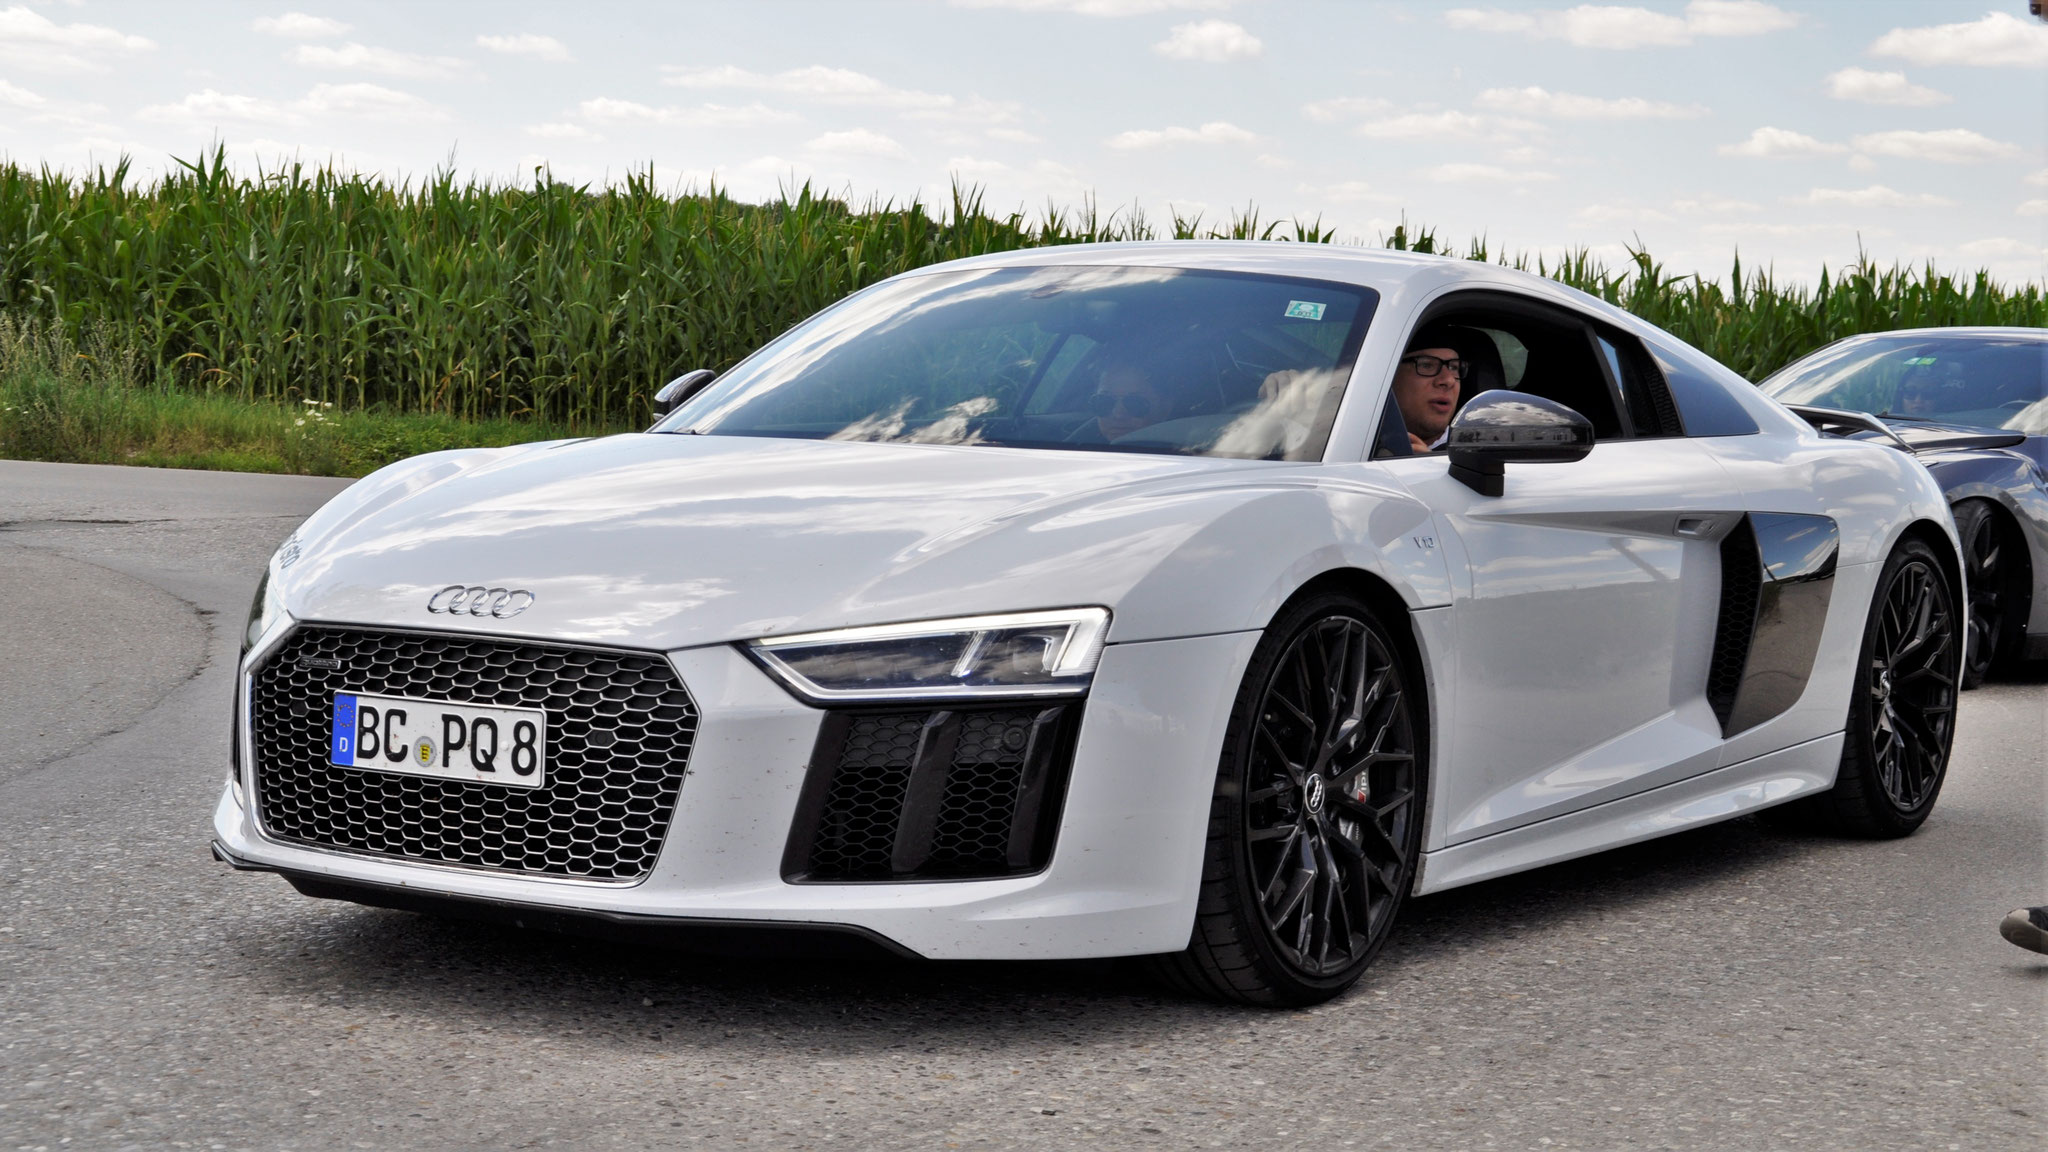 Audi R8 V10 - BC-PQ-8